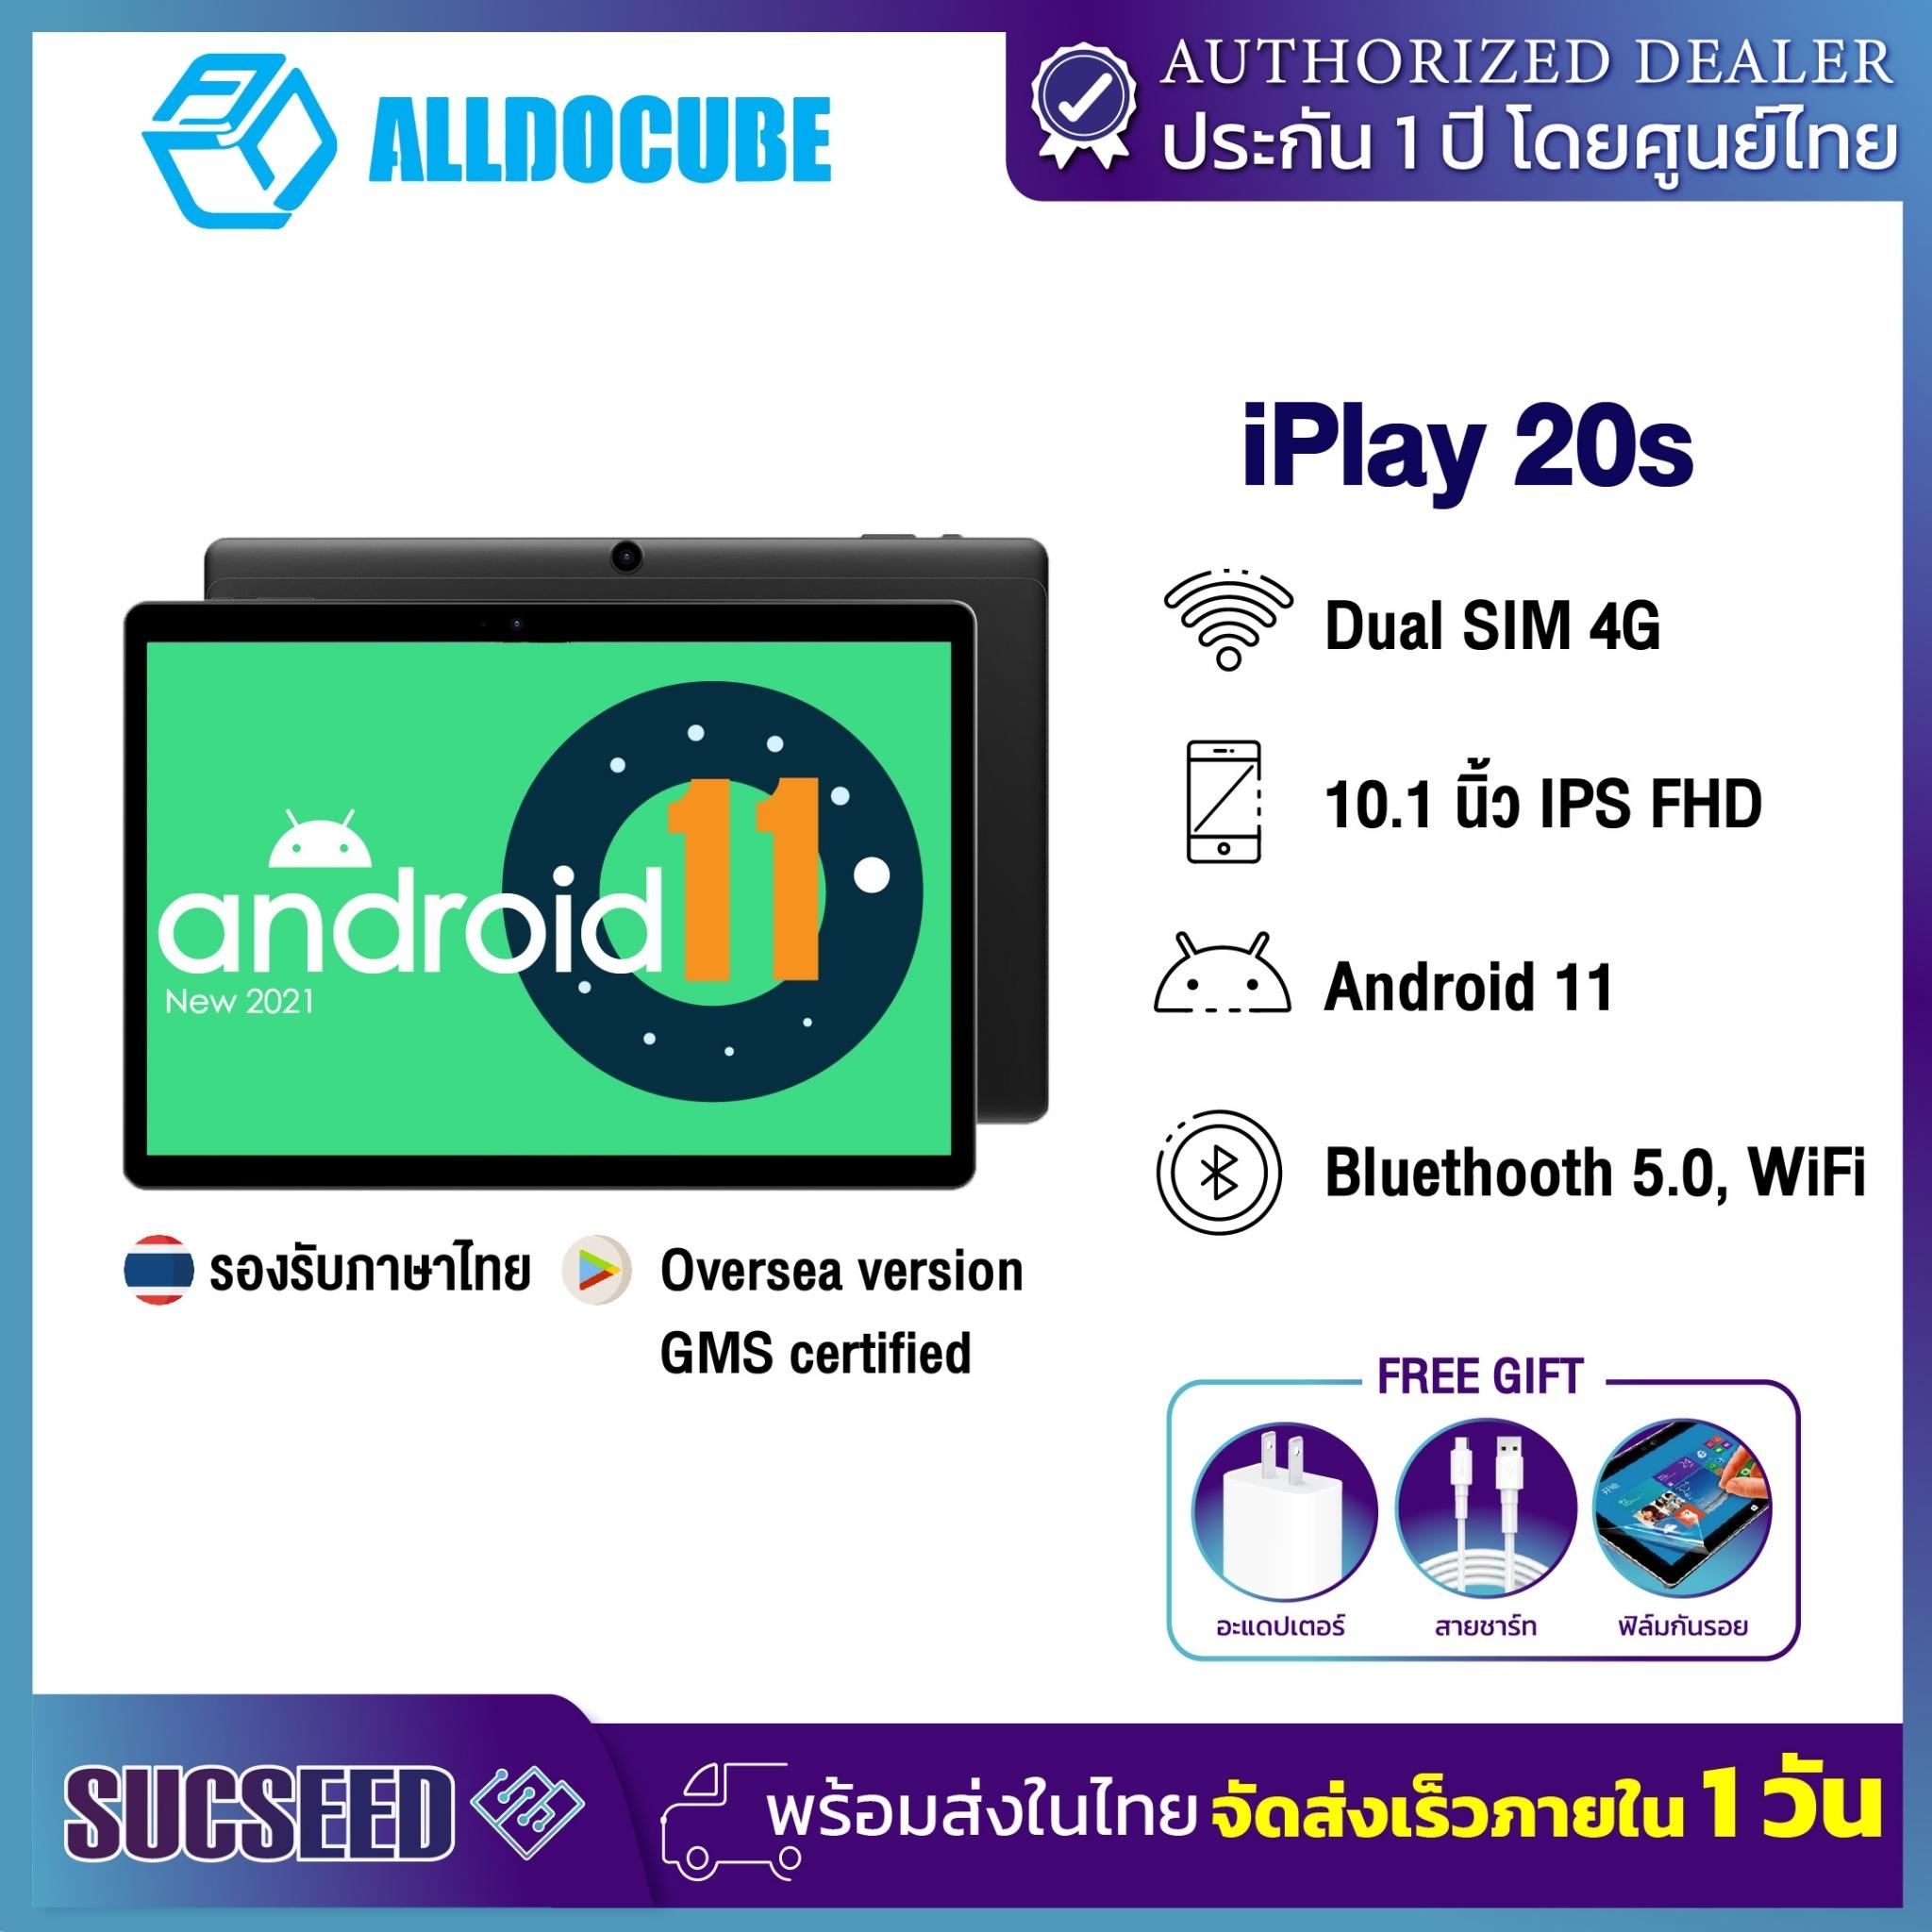 (NEW) พร้อมส่ง รุ่นใหม่ Alldocube iPlay 20S จอ 10.1 นิ้ว ใส่ซิม โทรได้ รองรับ 4G LTE Octa Core RAM 4GB ROM 64GB Android11 GPS Wifi2.4/5GHZ  ออกบิลใบกำกับภาษีได้/ประกันศูนย์ไทย 1ปี